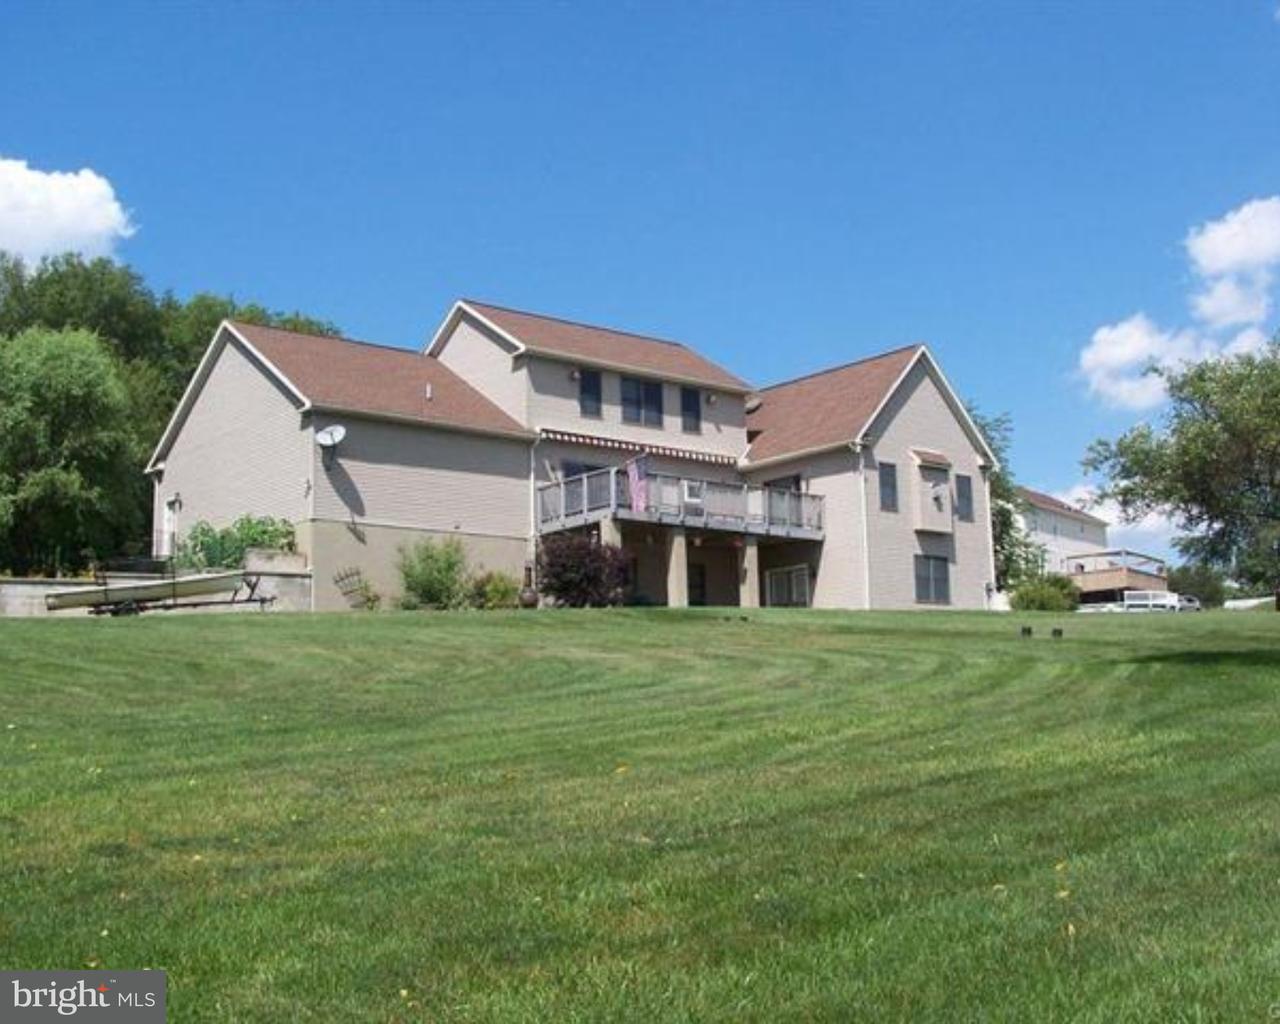 Single Family Home for Sale at 375 JEFFERSON Street Lehighton, Pennsylvania 18235 United States